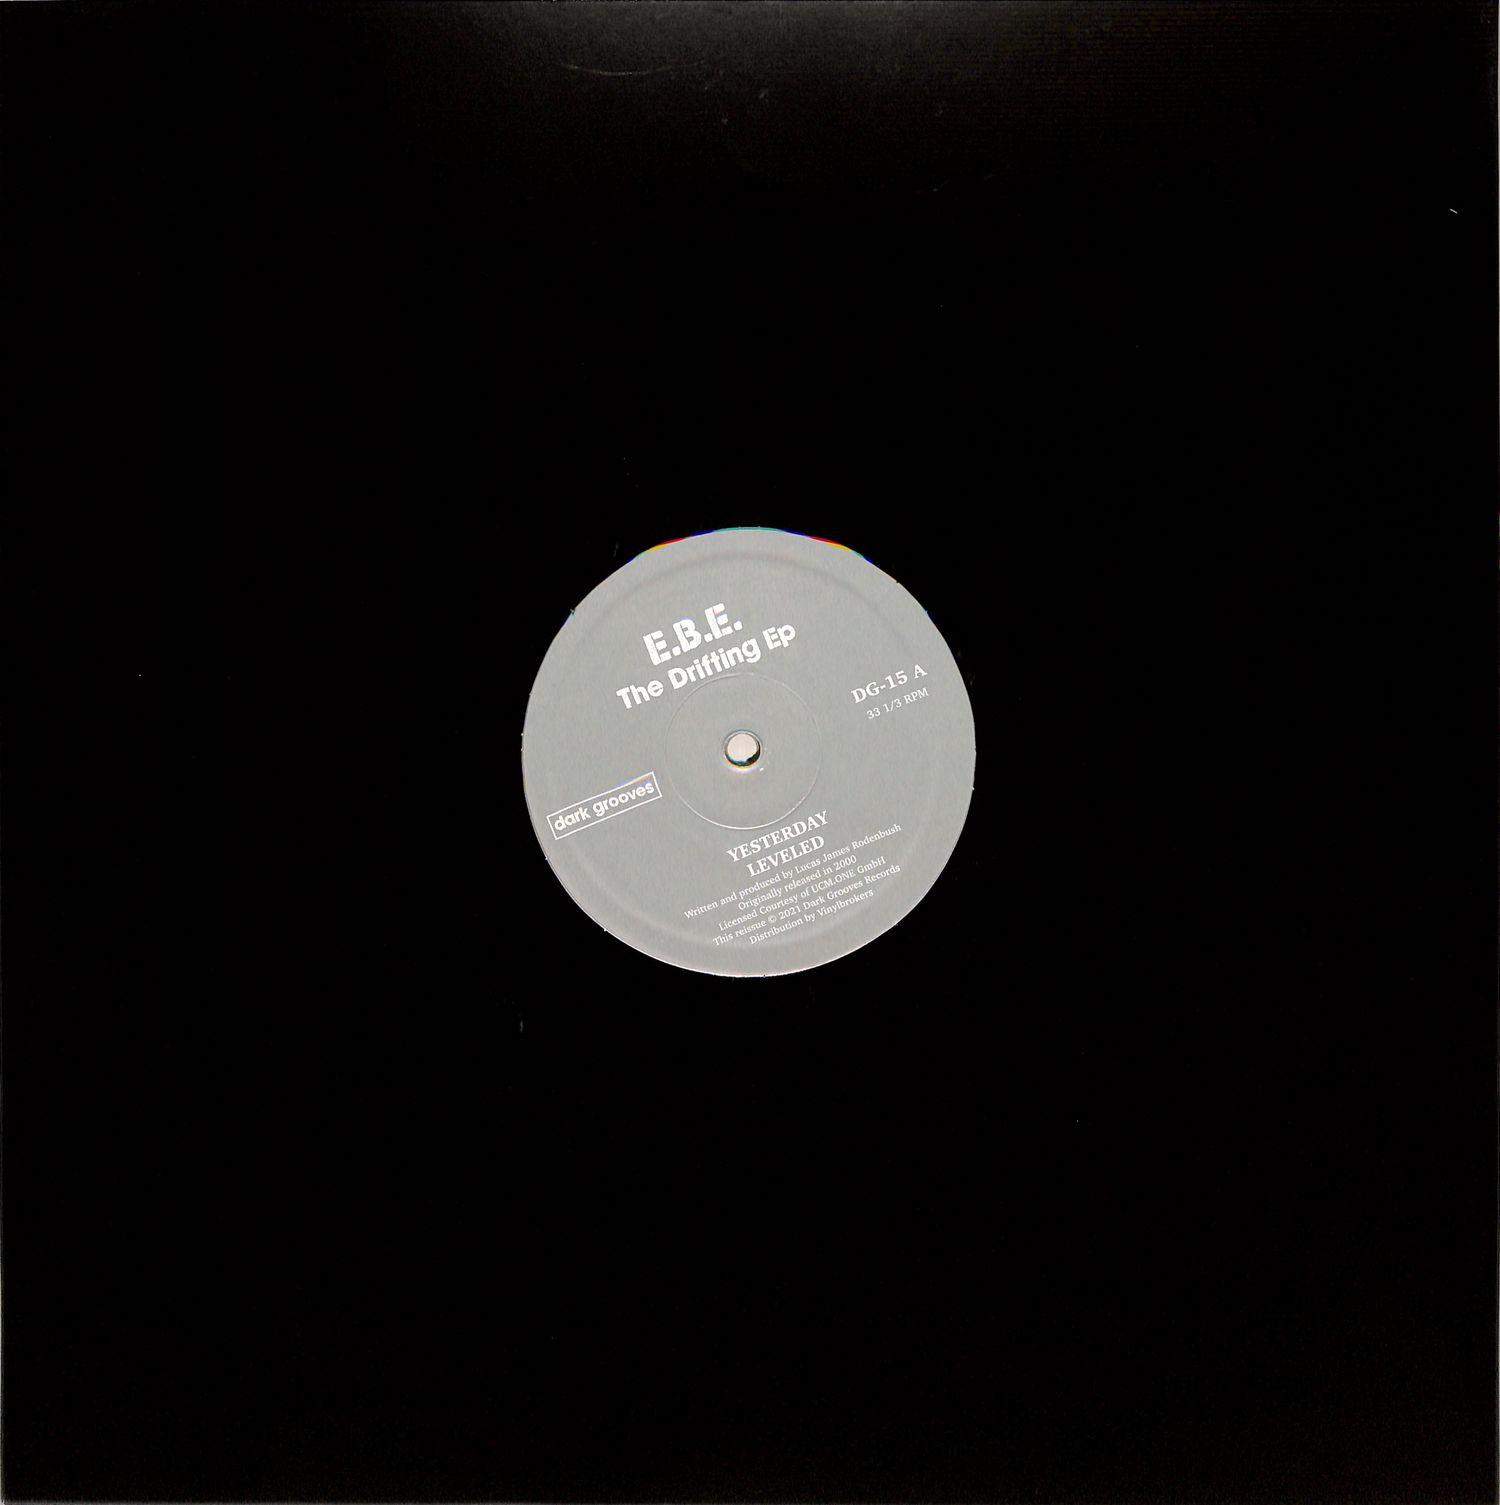 E.B.E. - THE DRIFTING EP